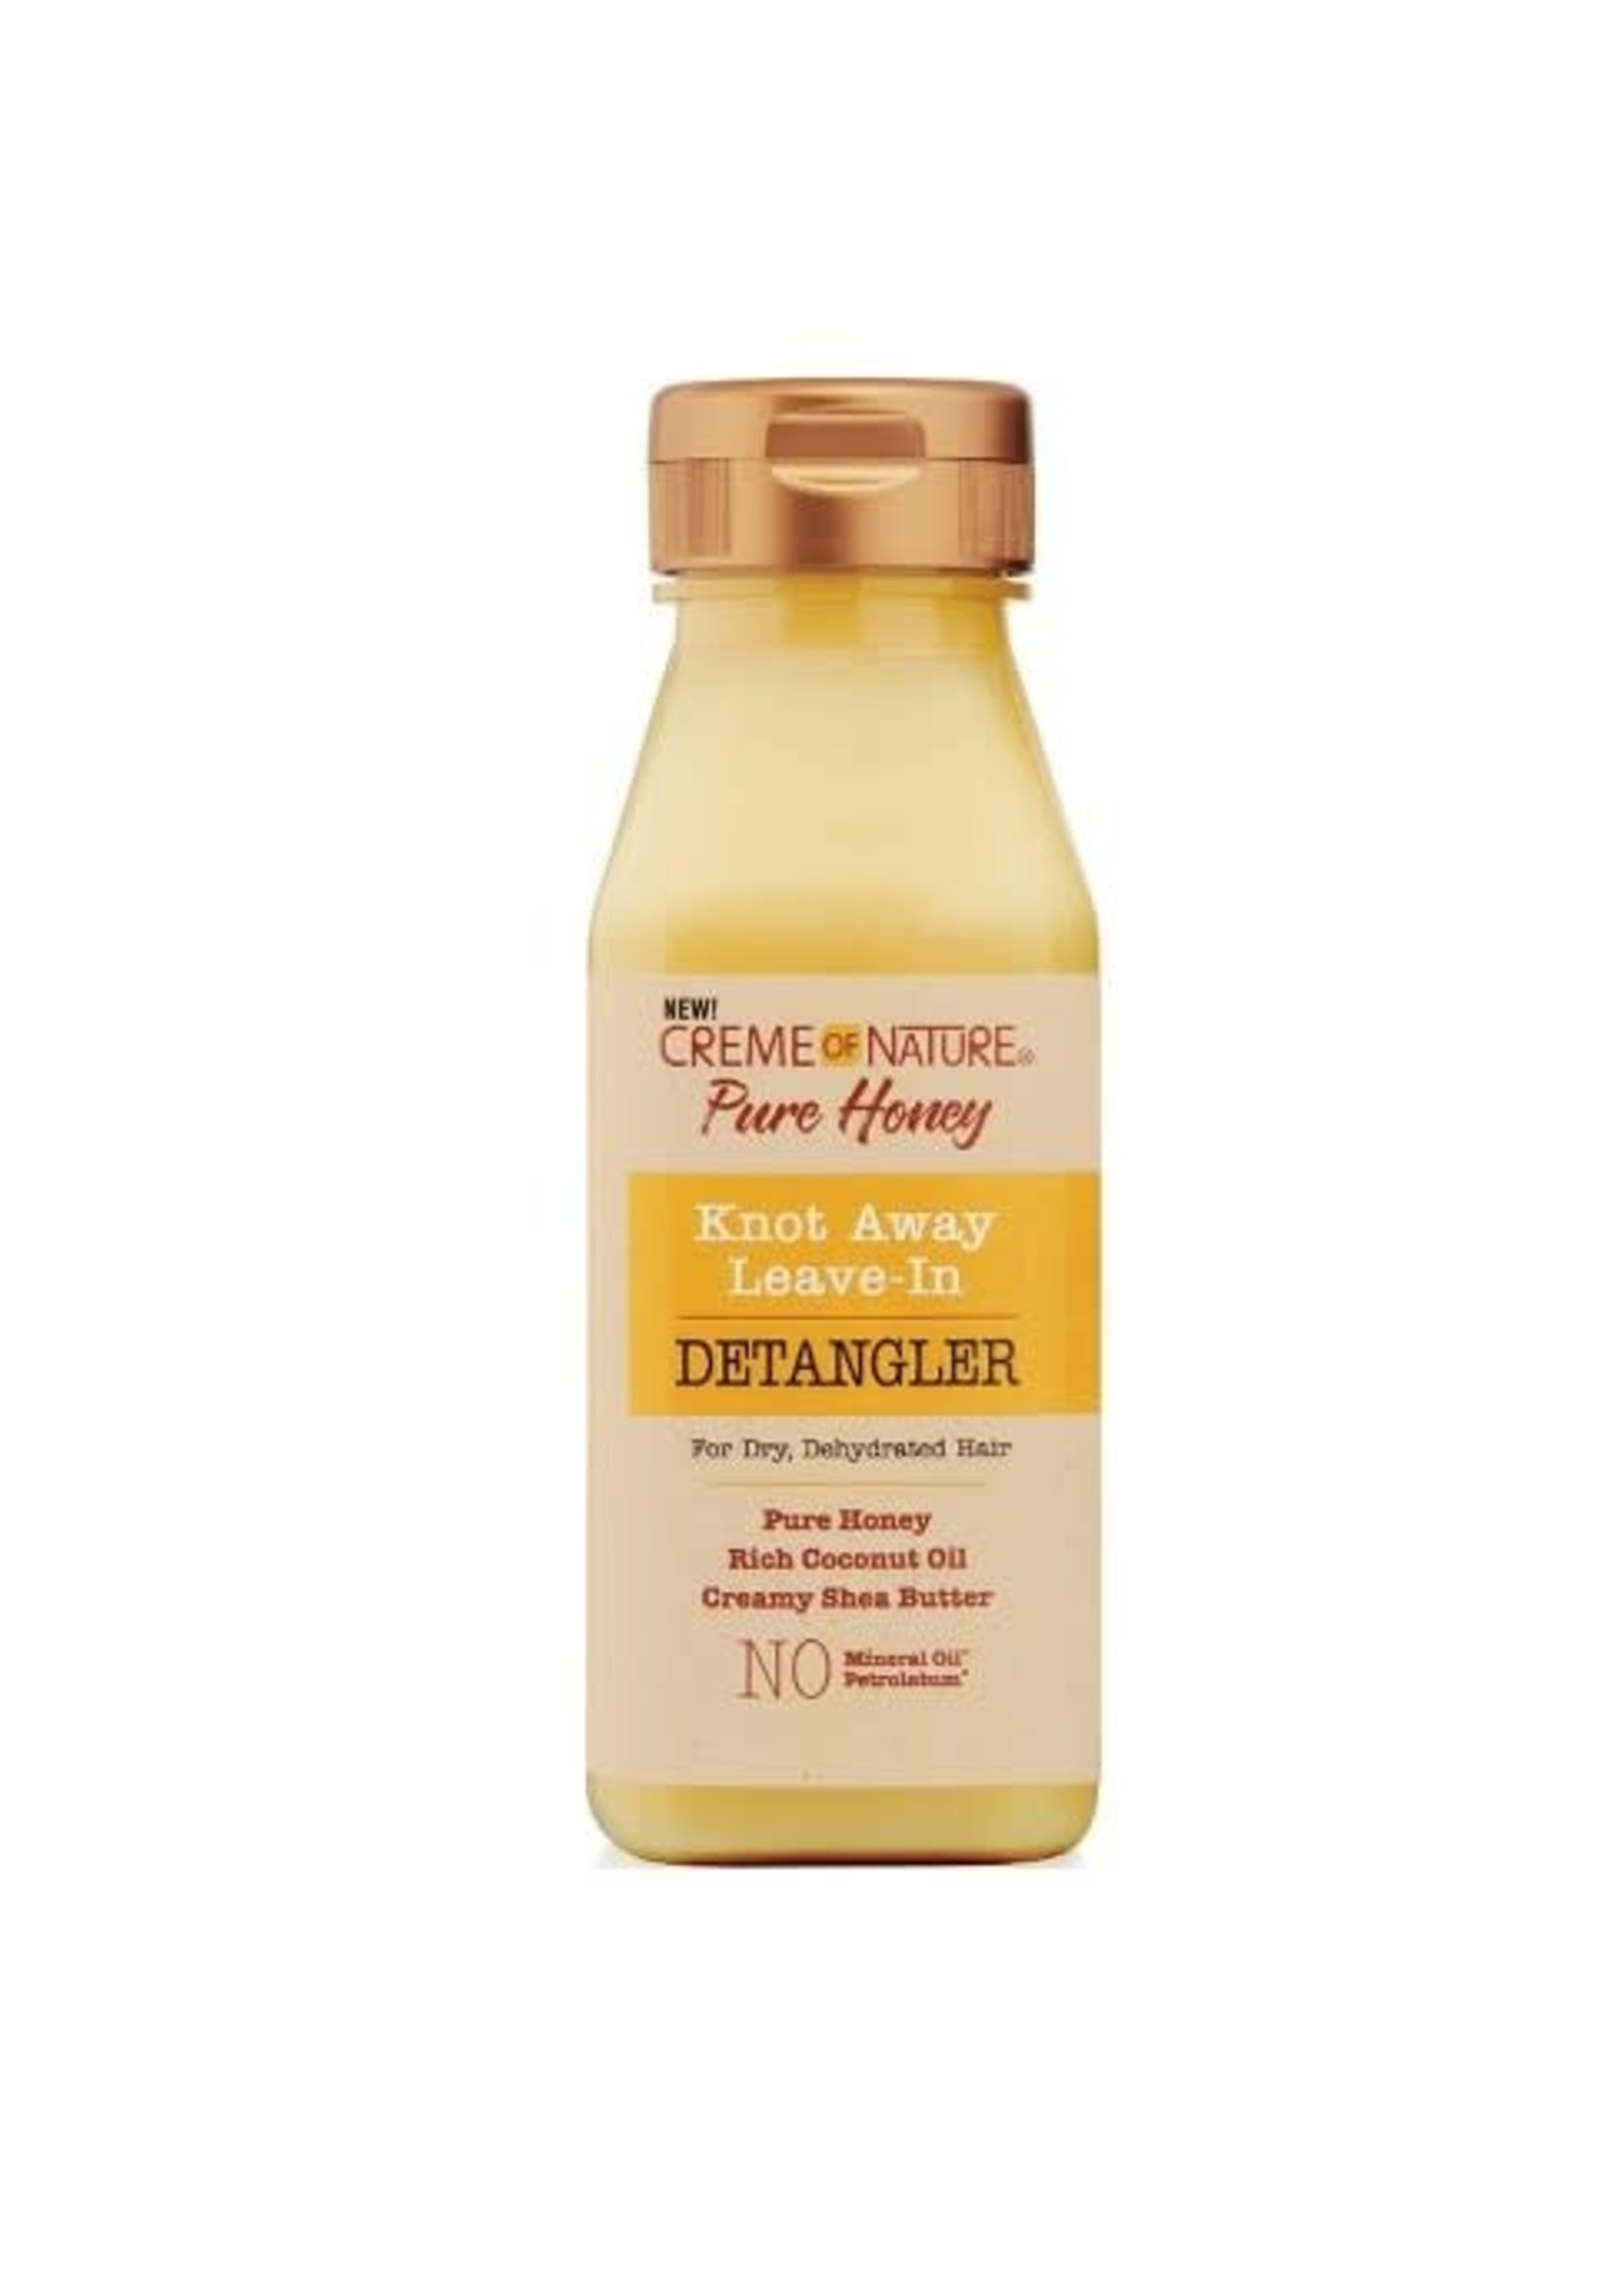 Cream of Nature Pure Honey Knot Away Leave In Detangler